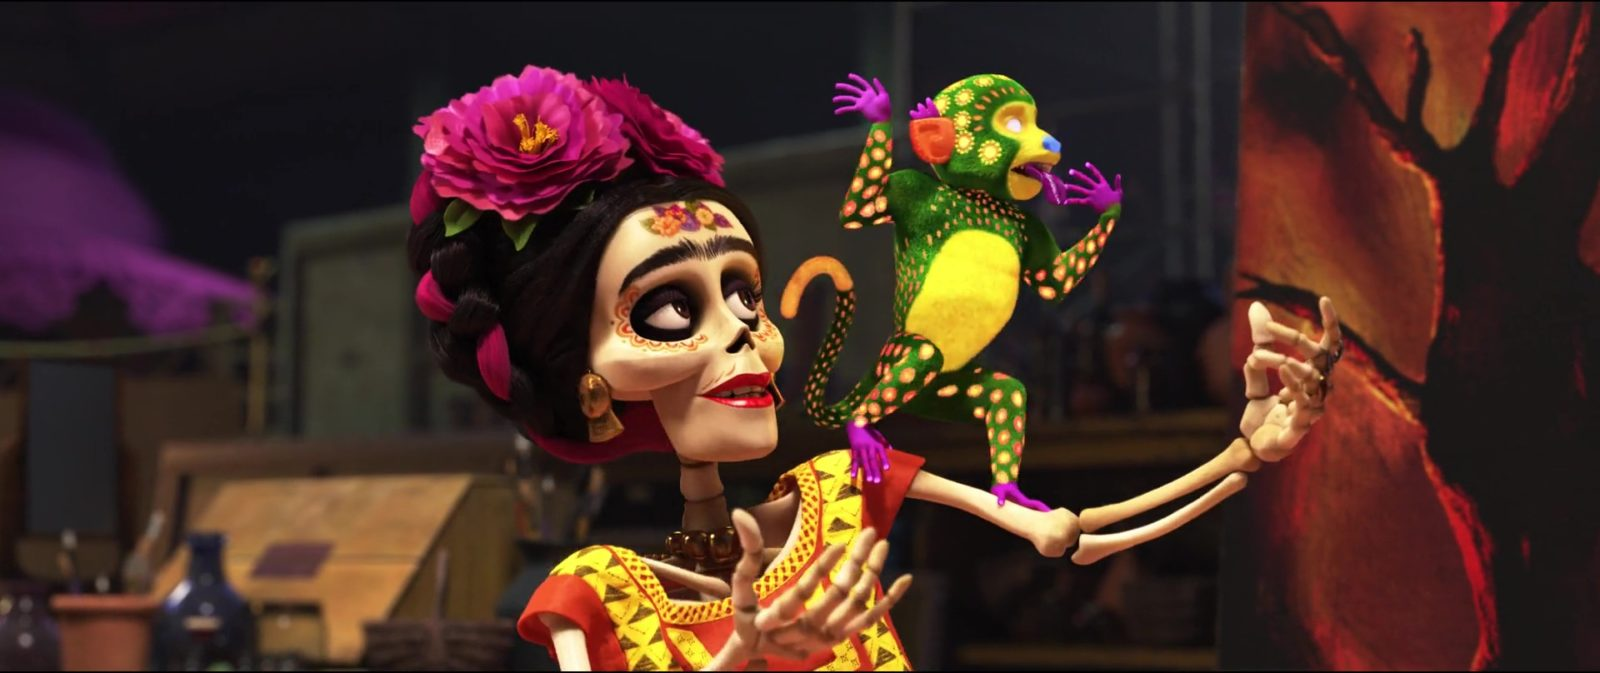 Frida Kahlo dans Coco de Disney, 2017.